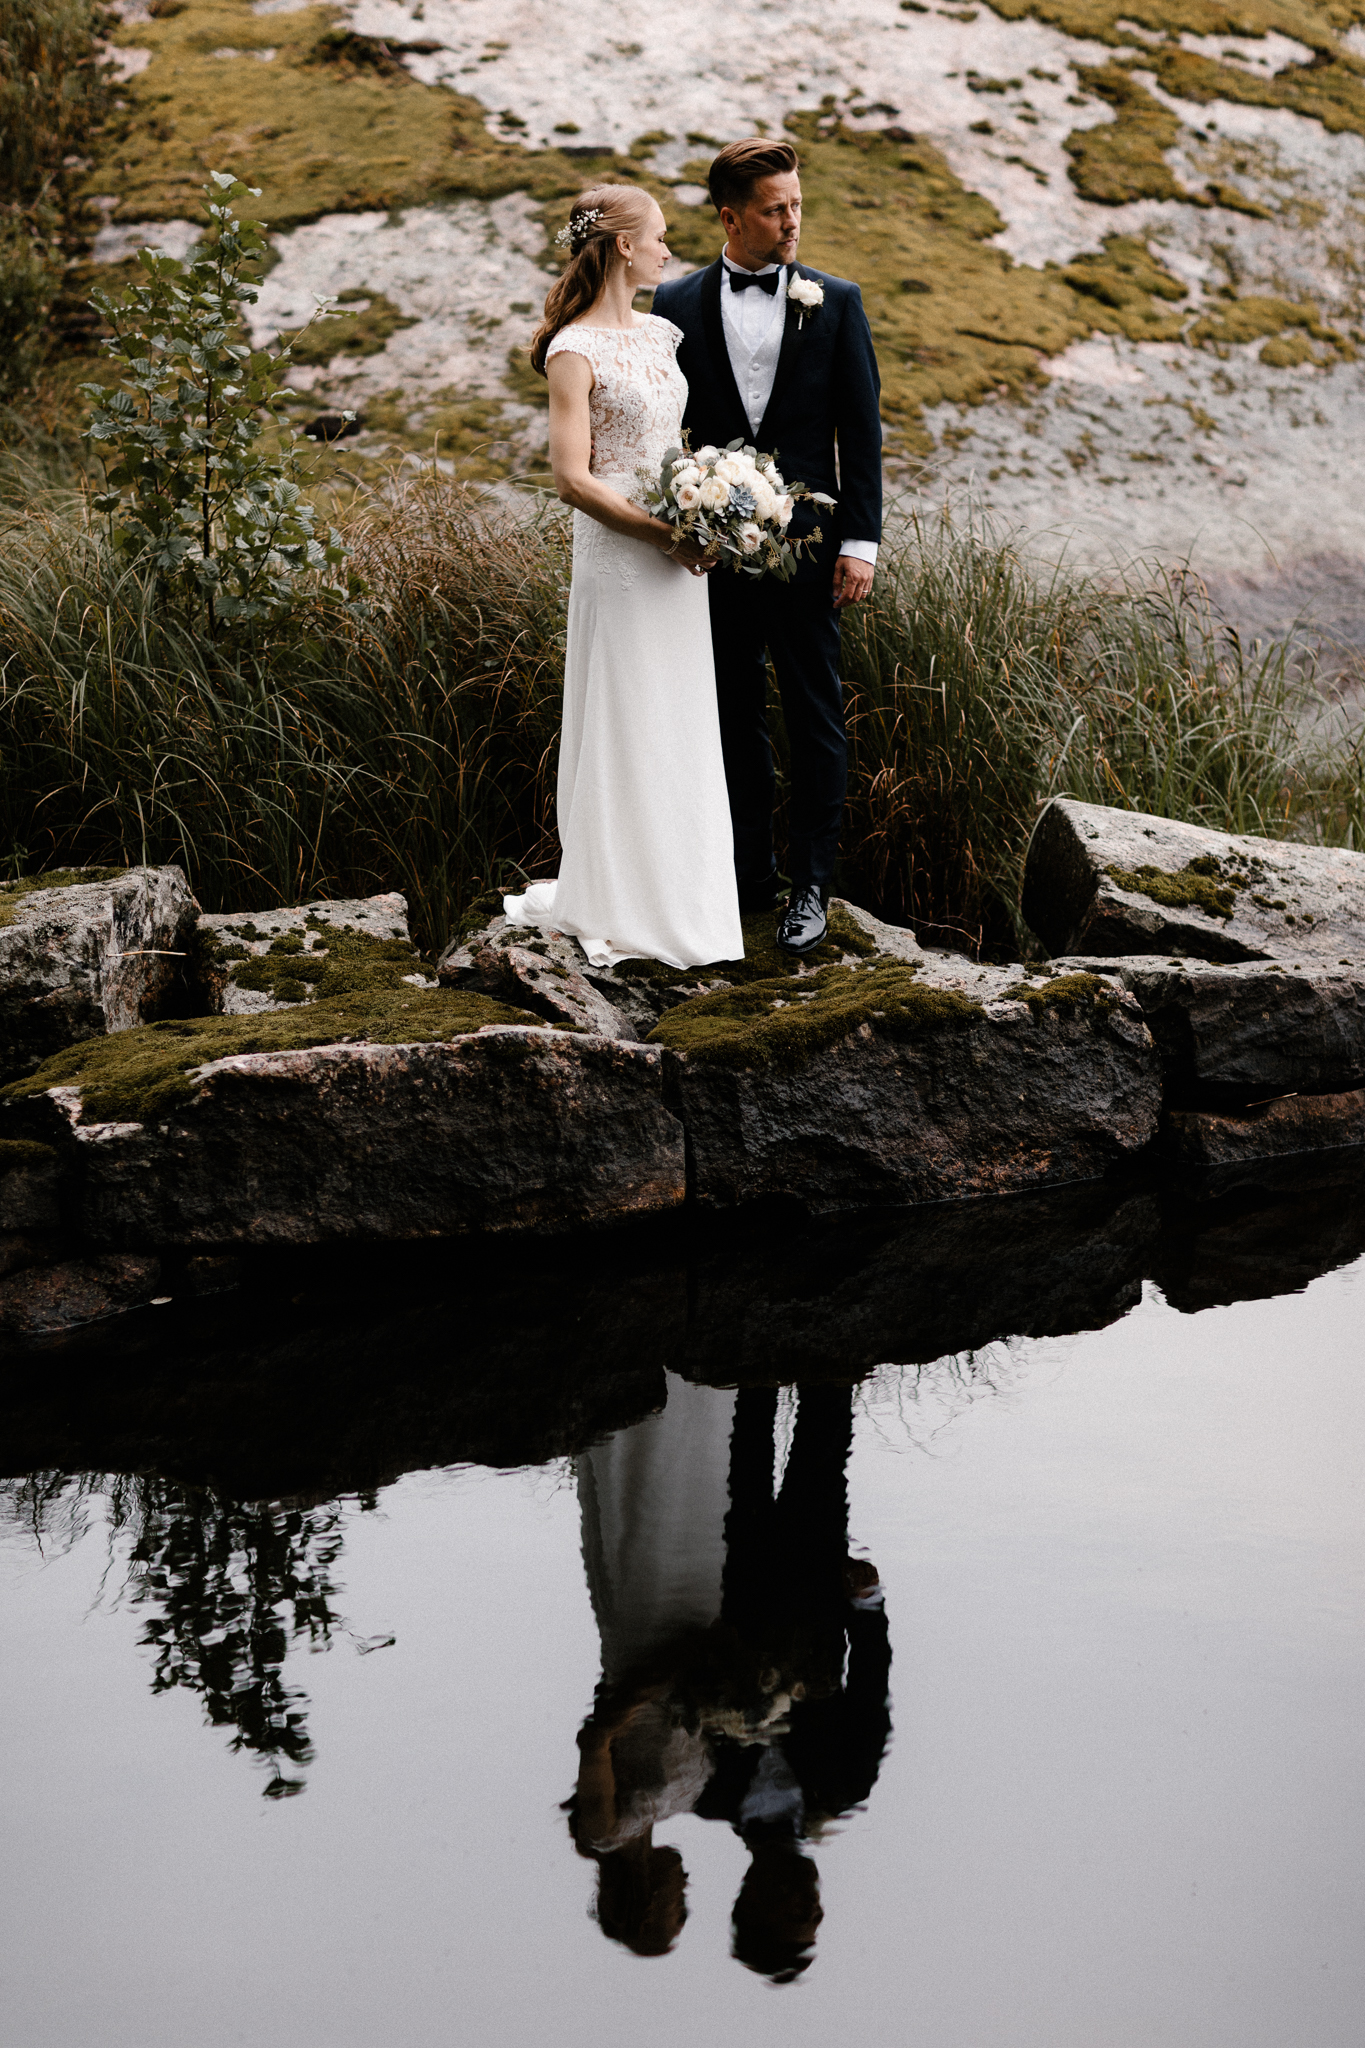 Jessica + Patrick | Fagervik | by Patrick Karkkolainen Wedding Photography-8.jpg